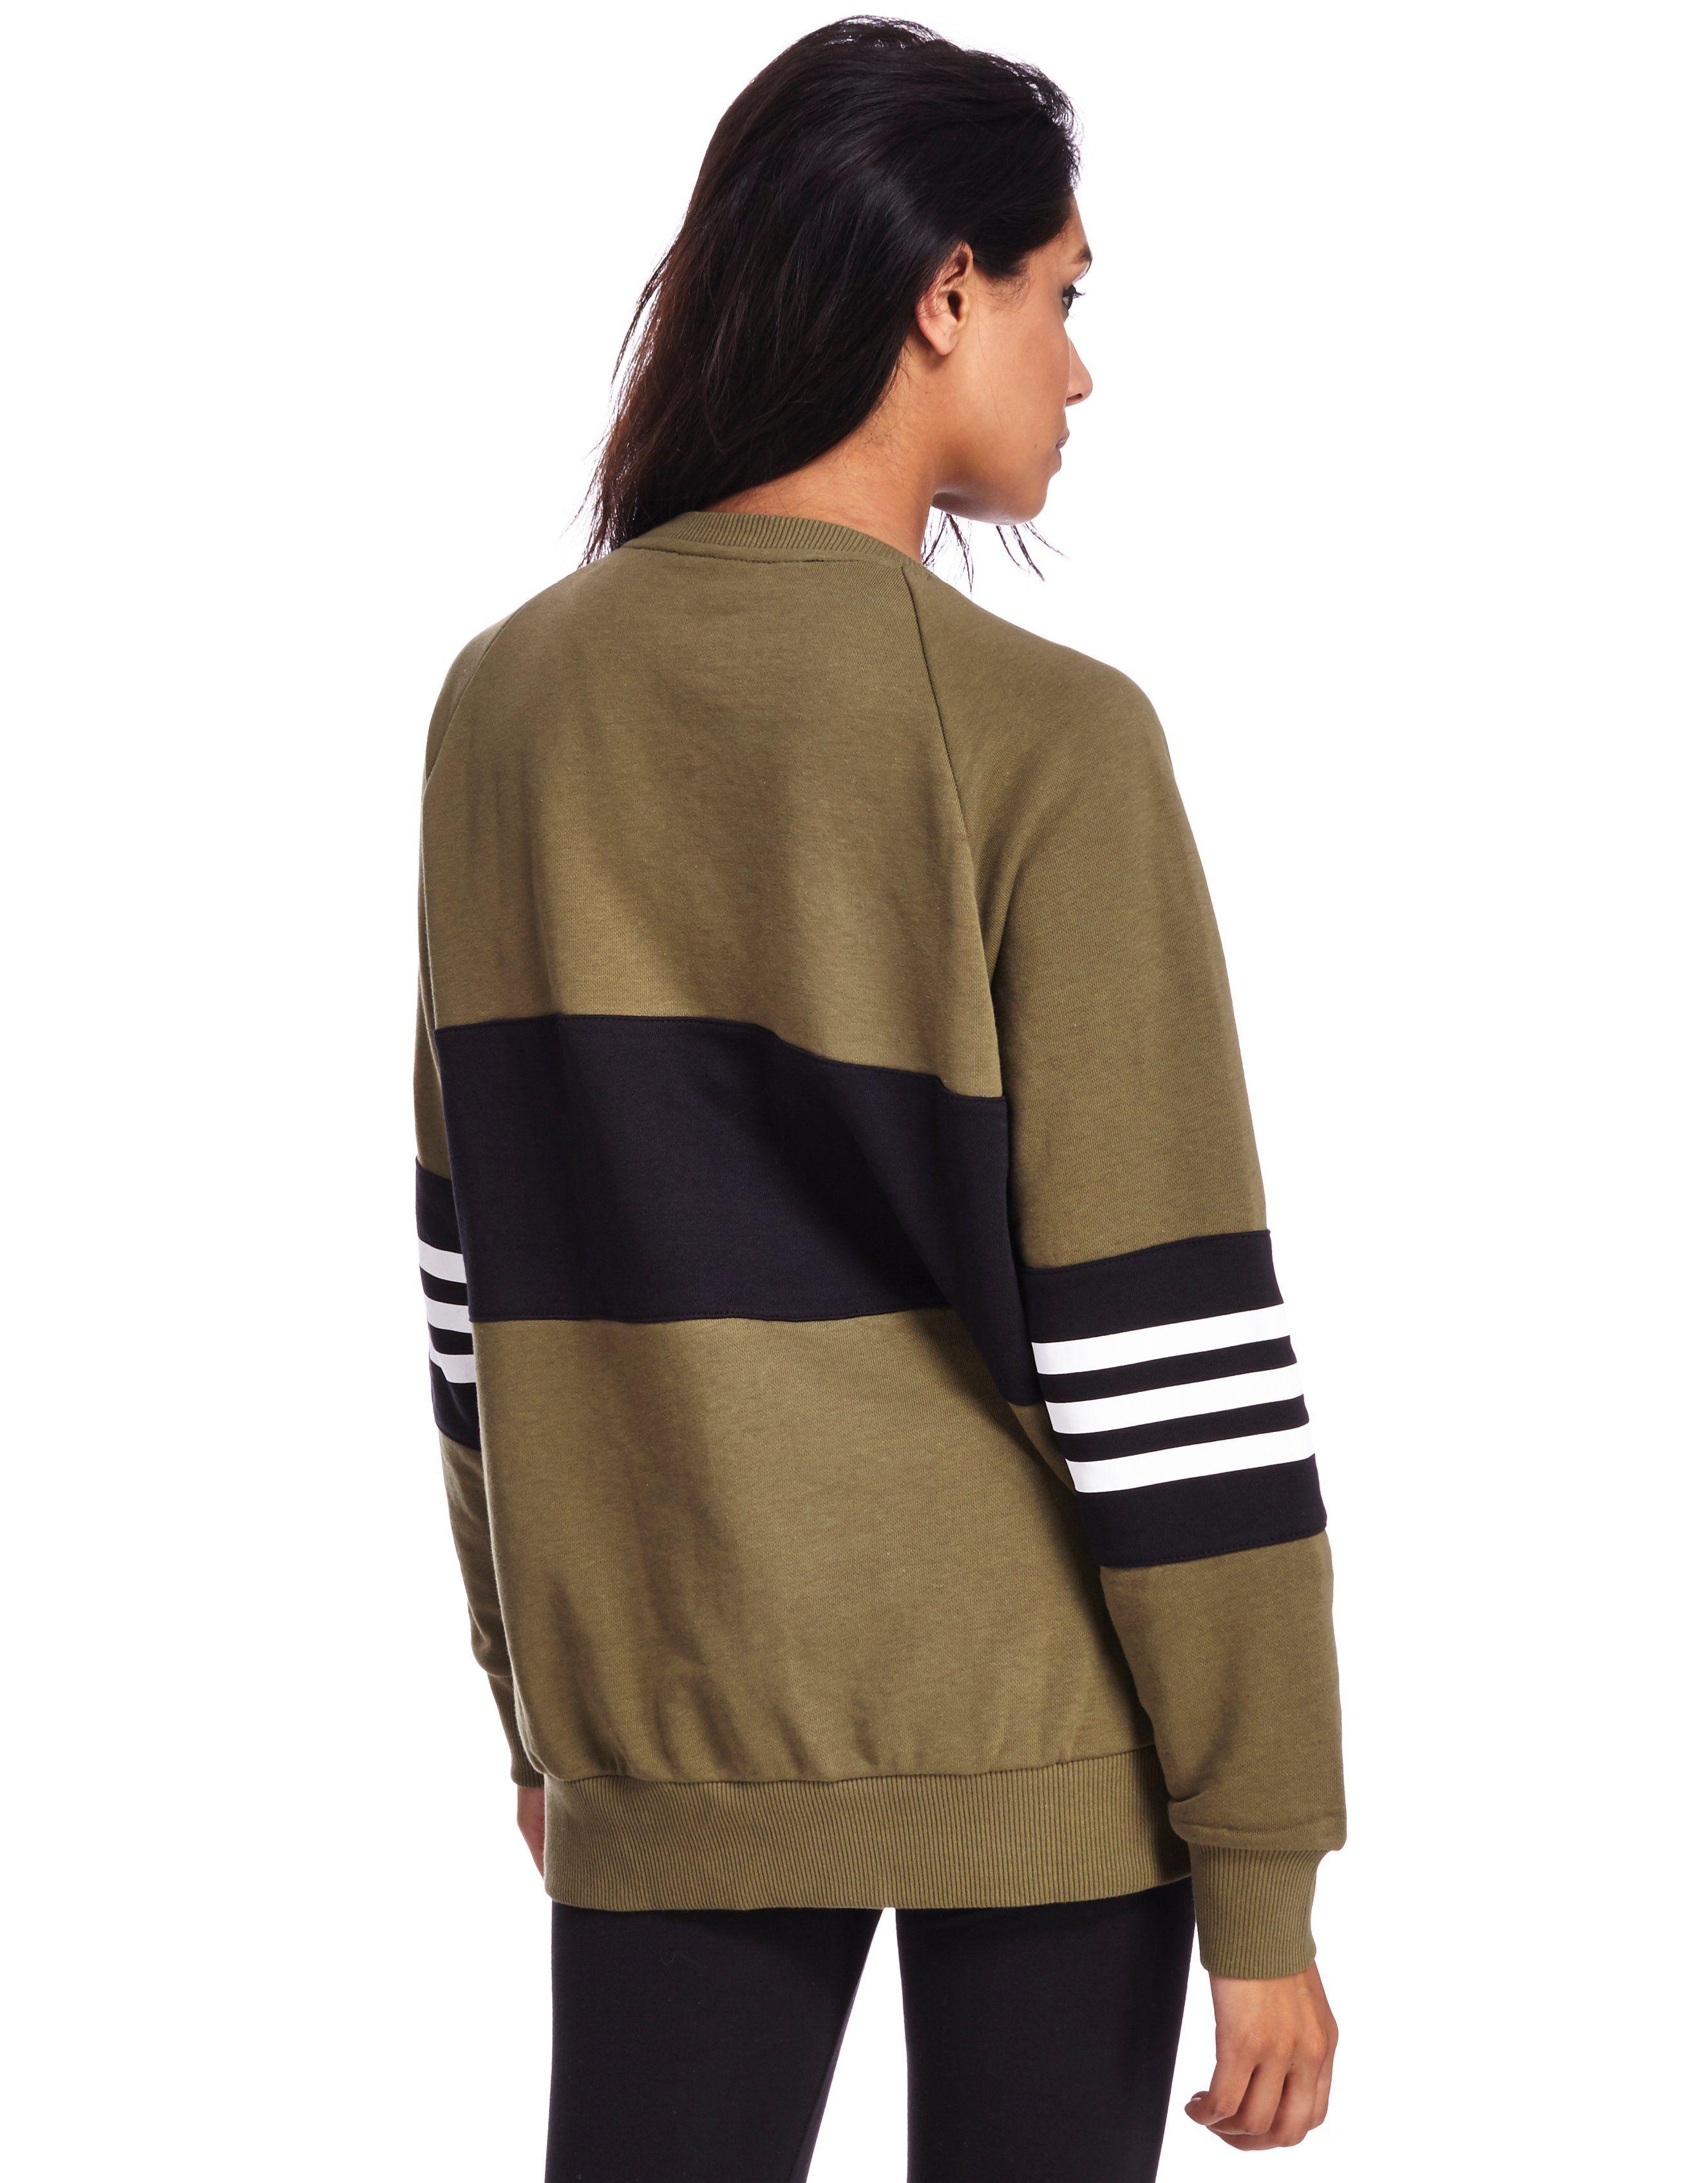 adidas Originals Street Crew Sweatshirt